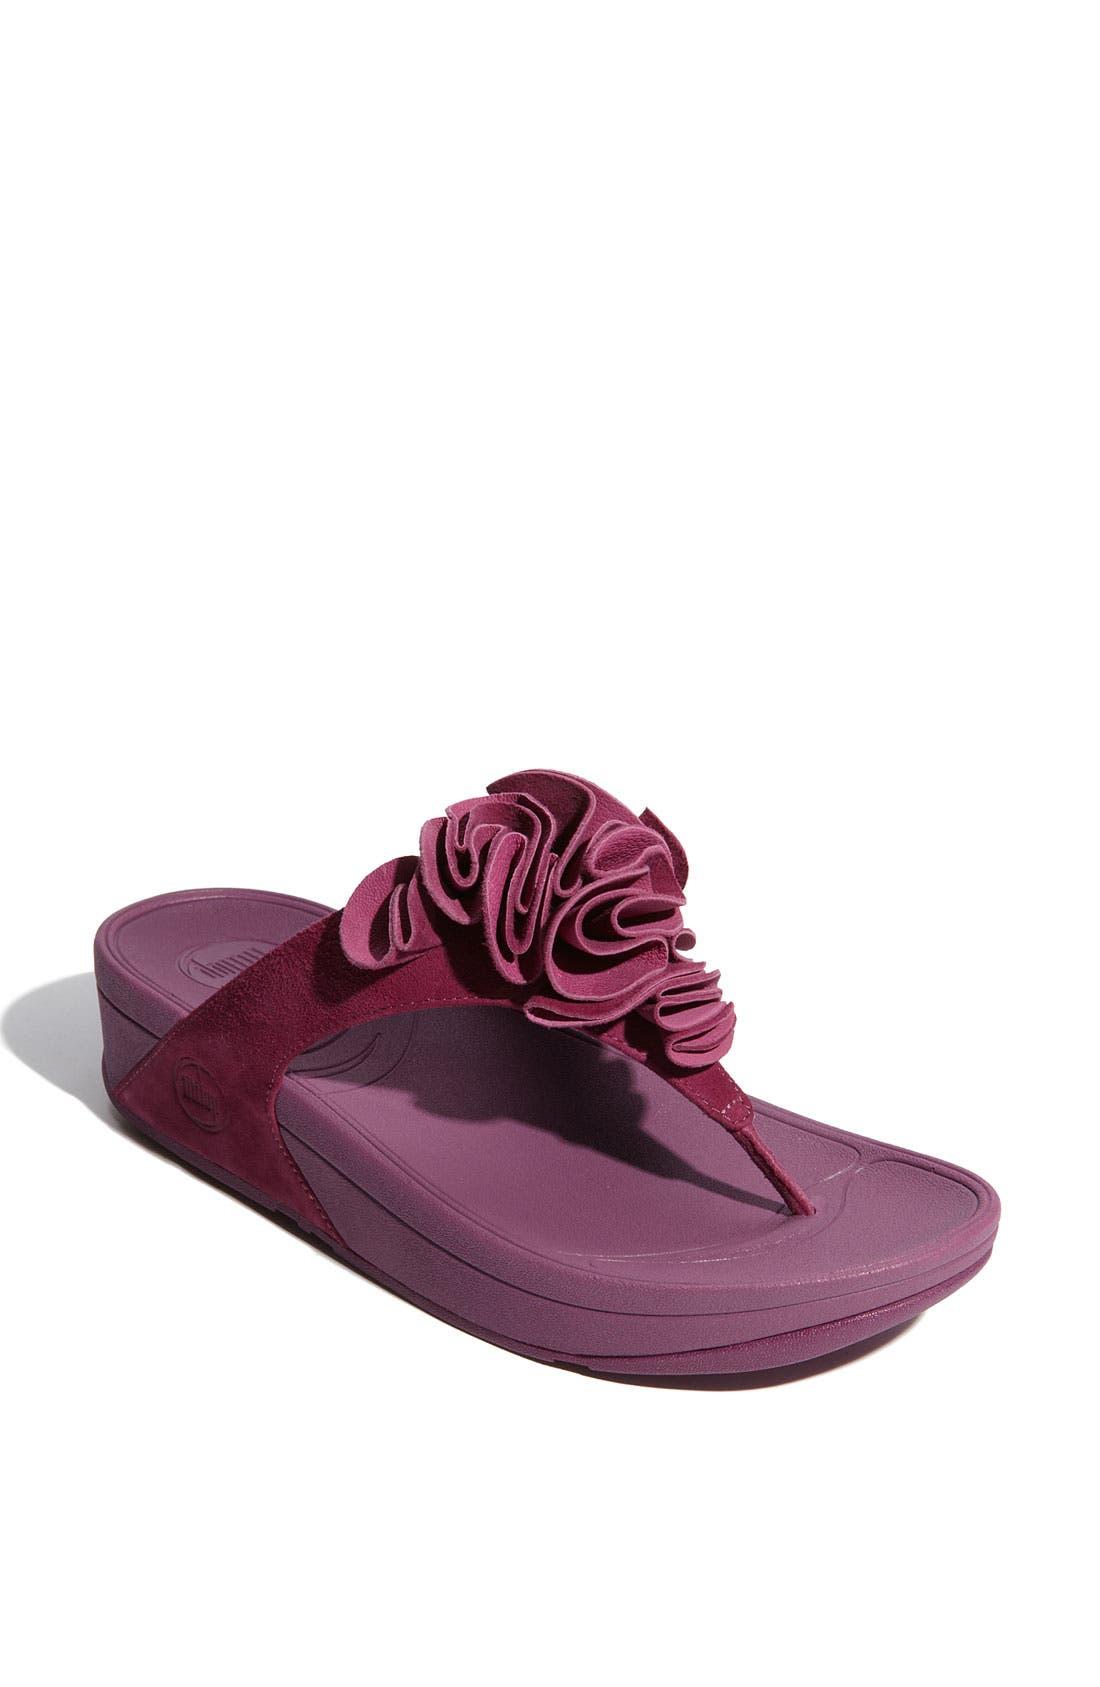 'Frou<sup>™</sup>' Sandal,                             Main thumbnail 5, color,